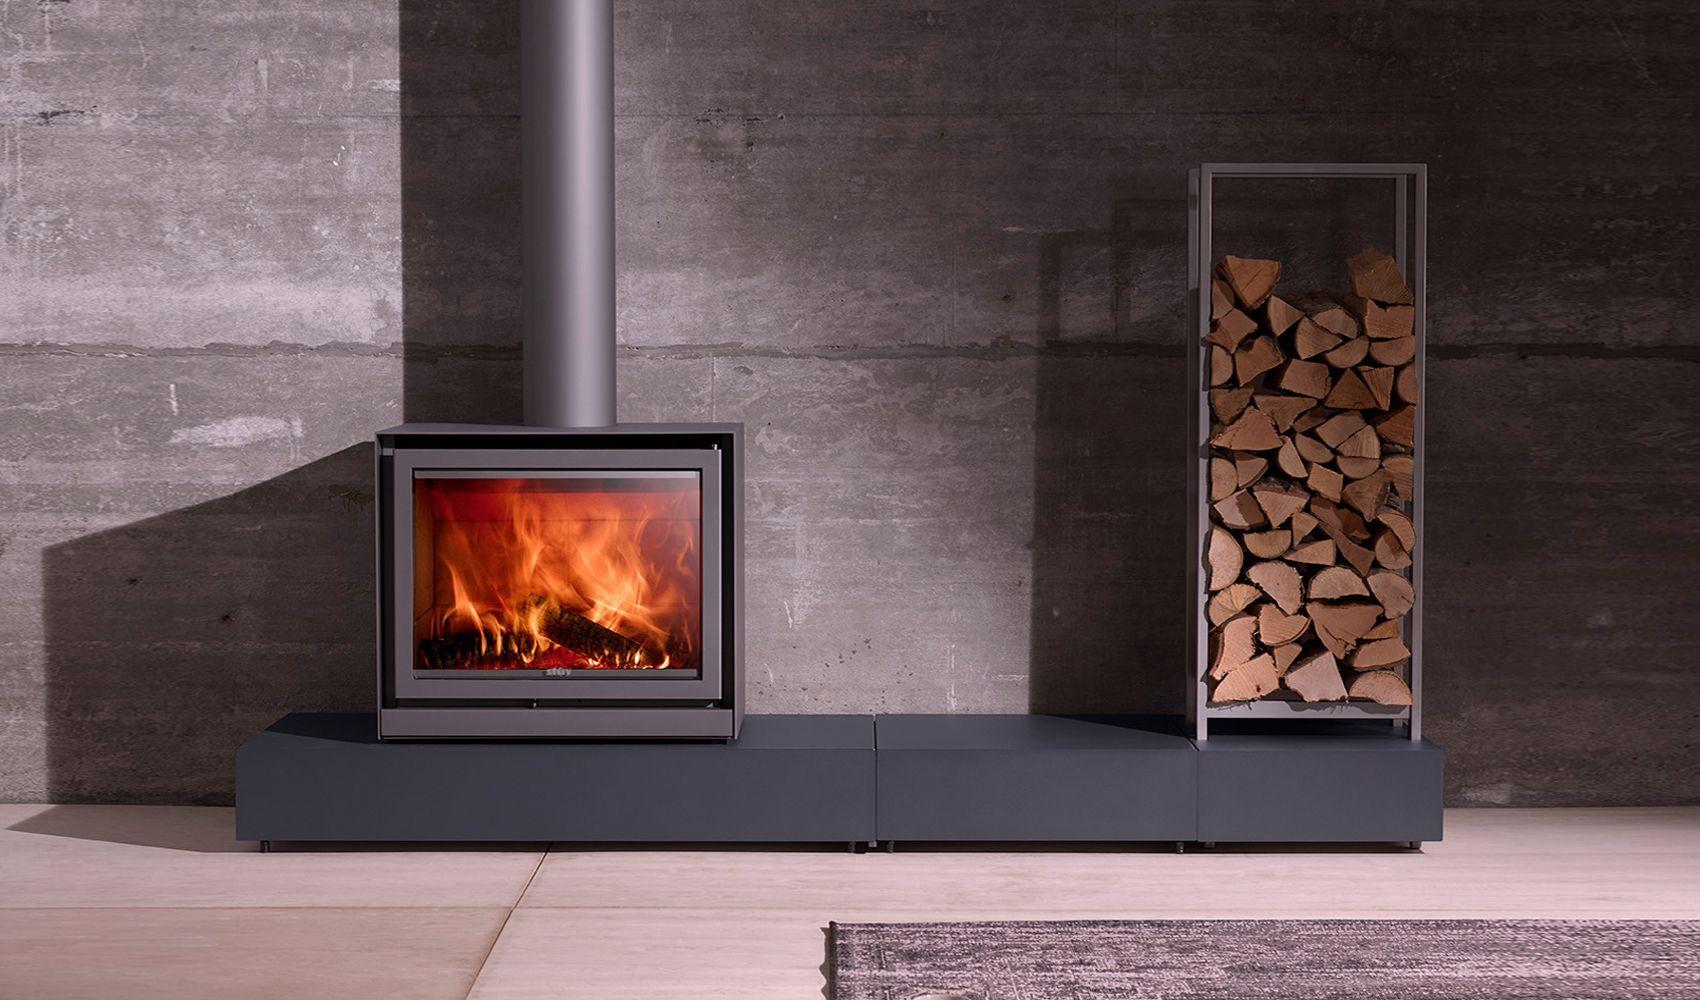 Pin By Gwen Buijteweg On Modern Fireplaces Wood Stoves Freestanding Fireplace Wood Burning Fireplace Inserts Wood Burning Stoves Living Room